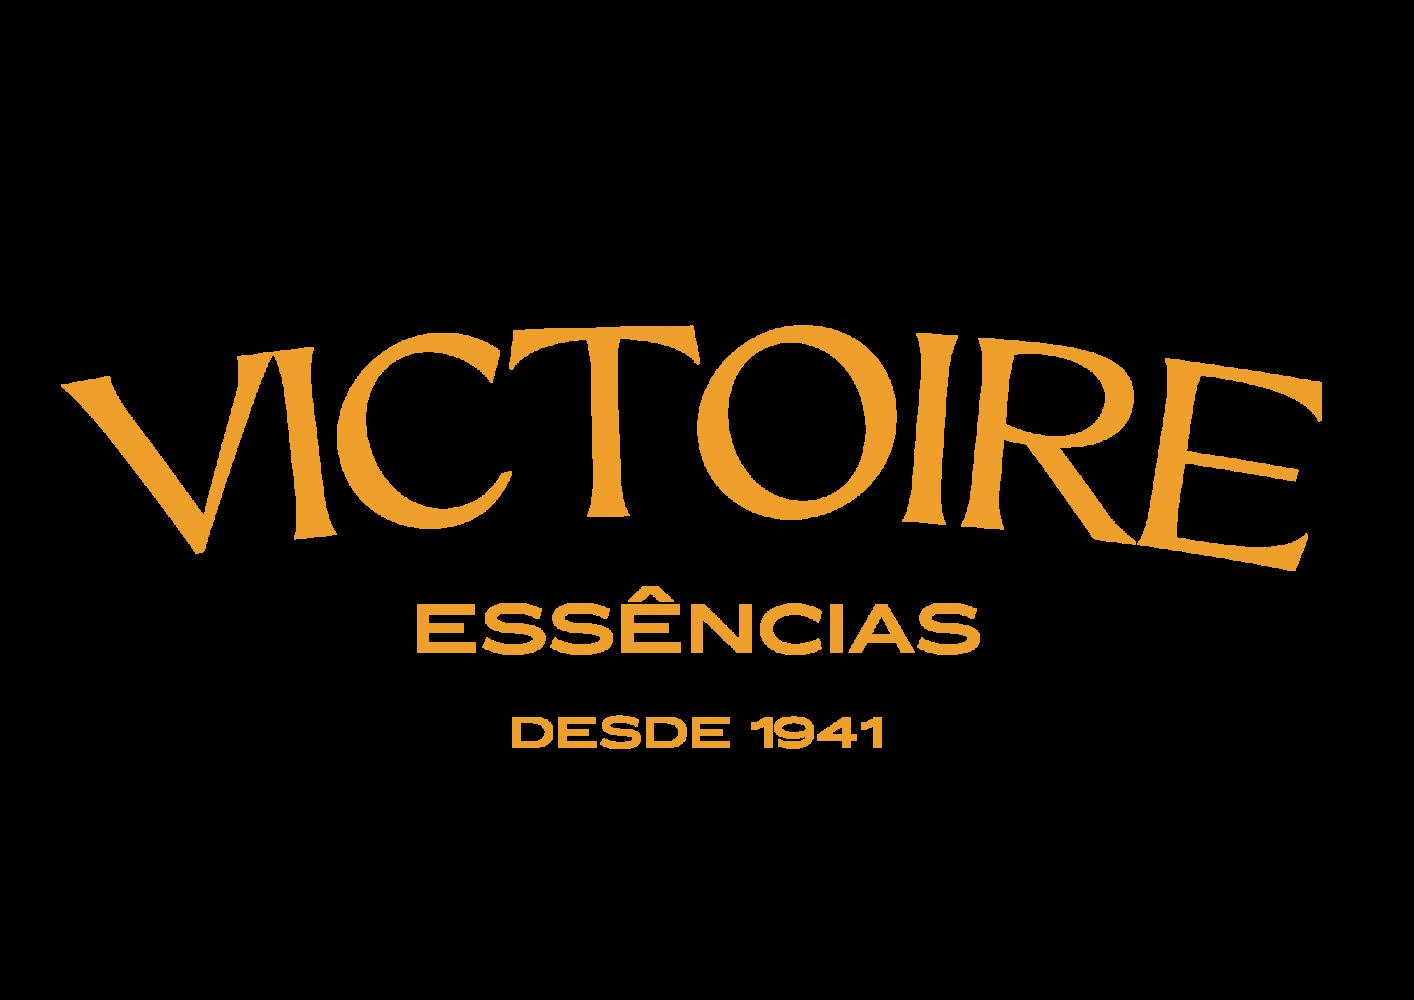 Victoire Essências